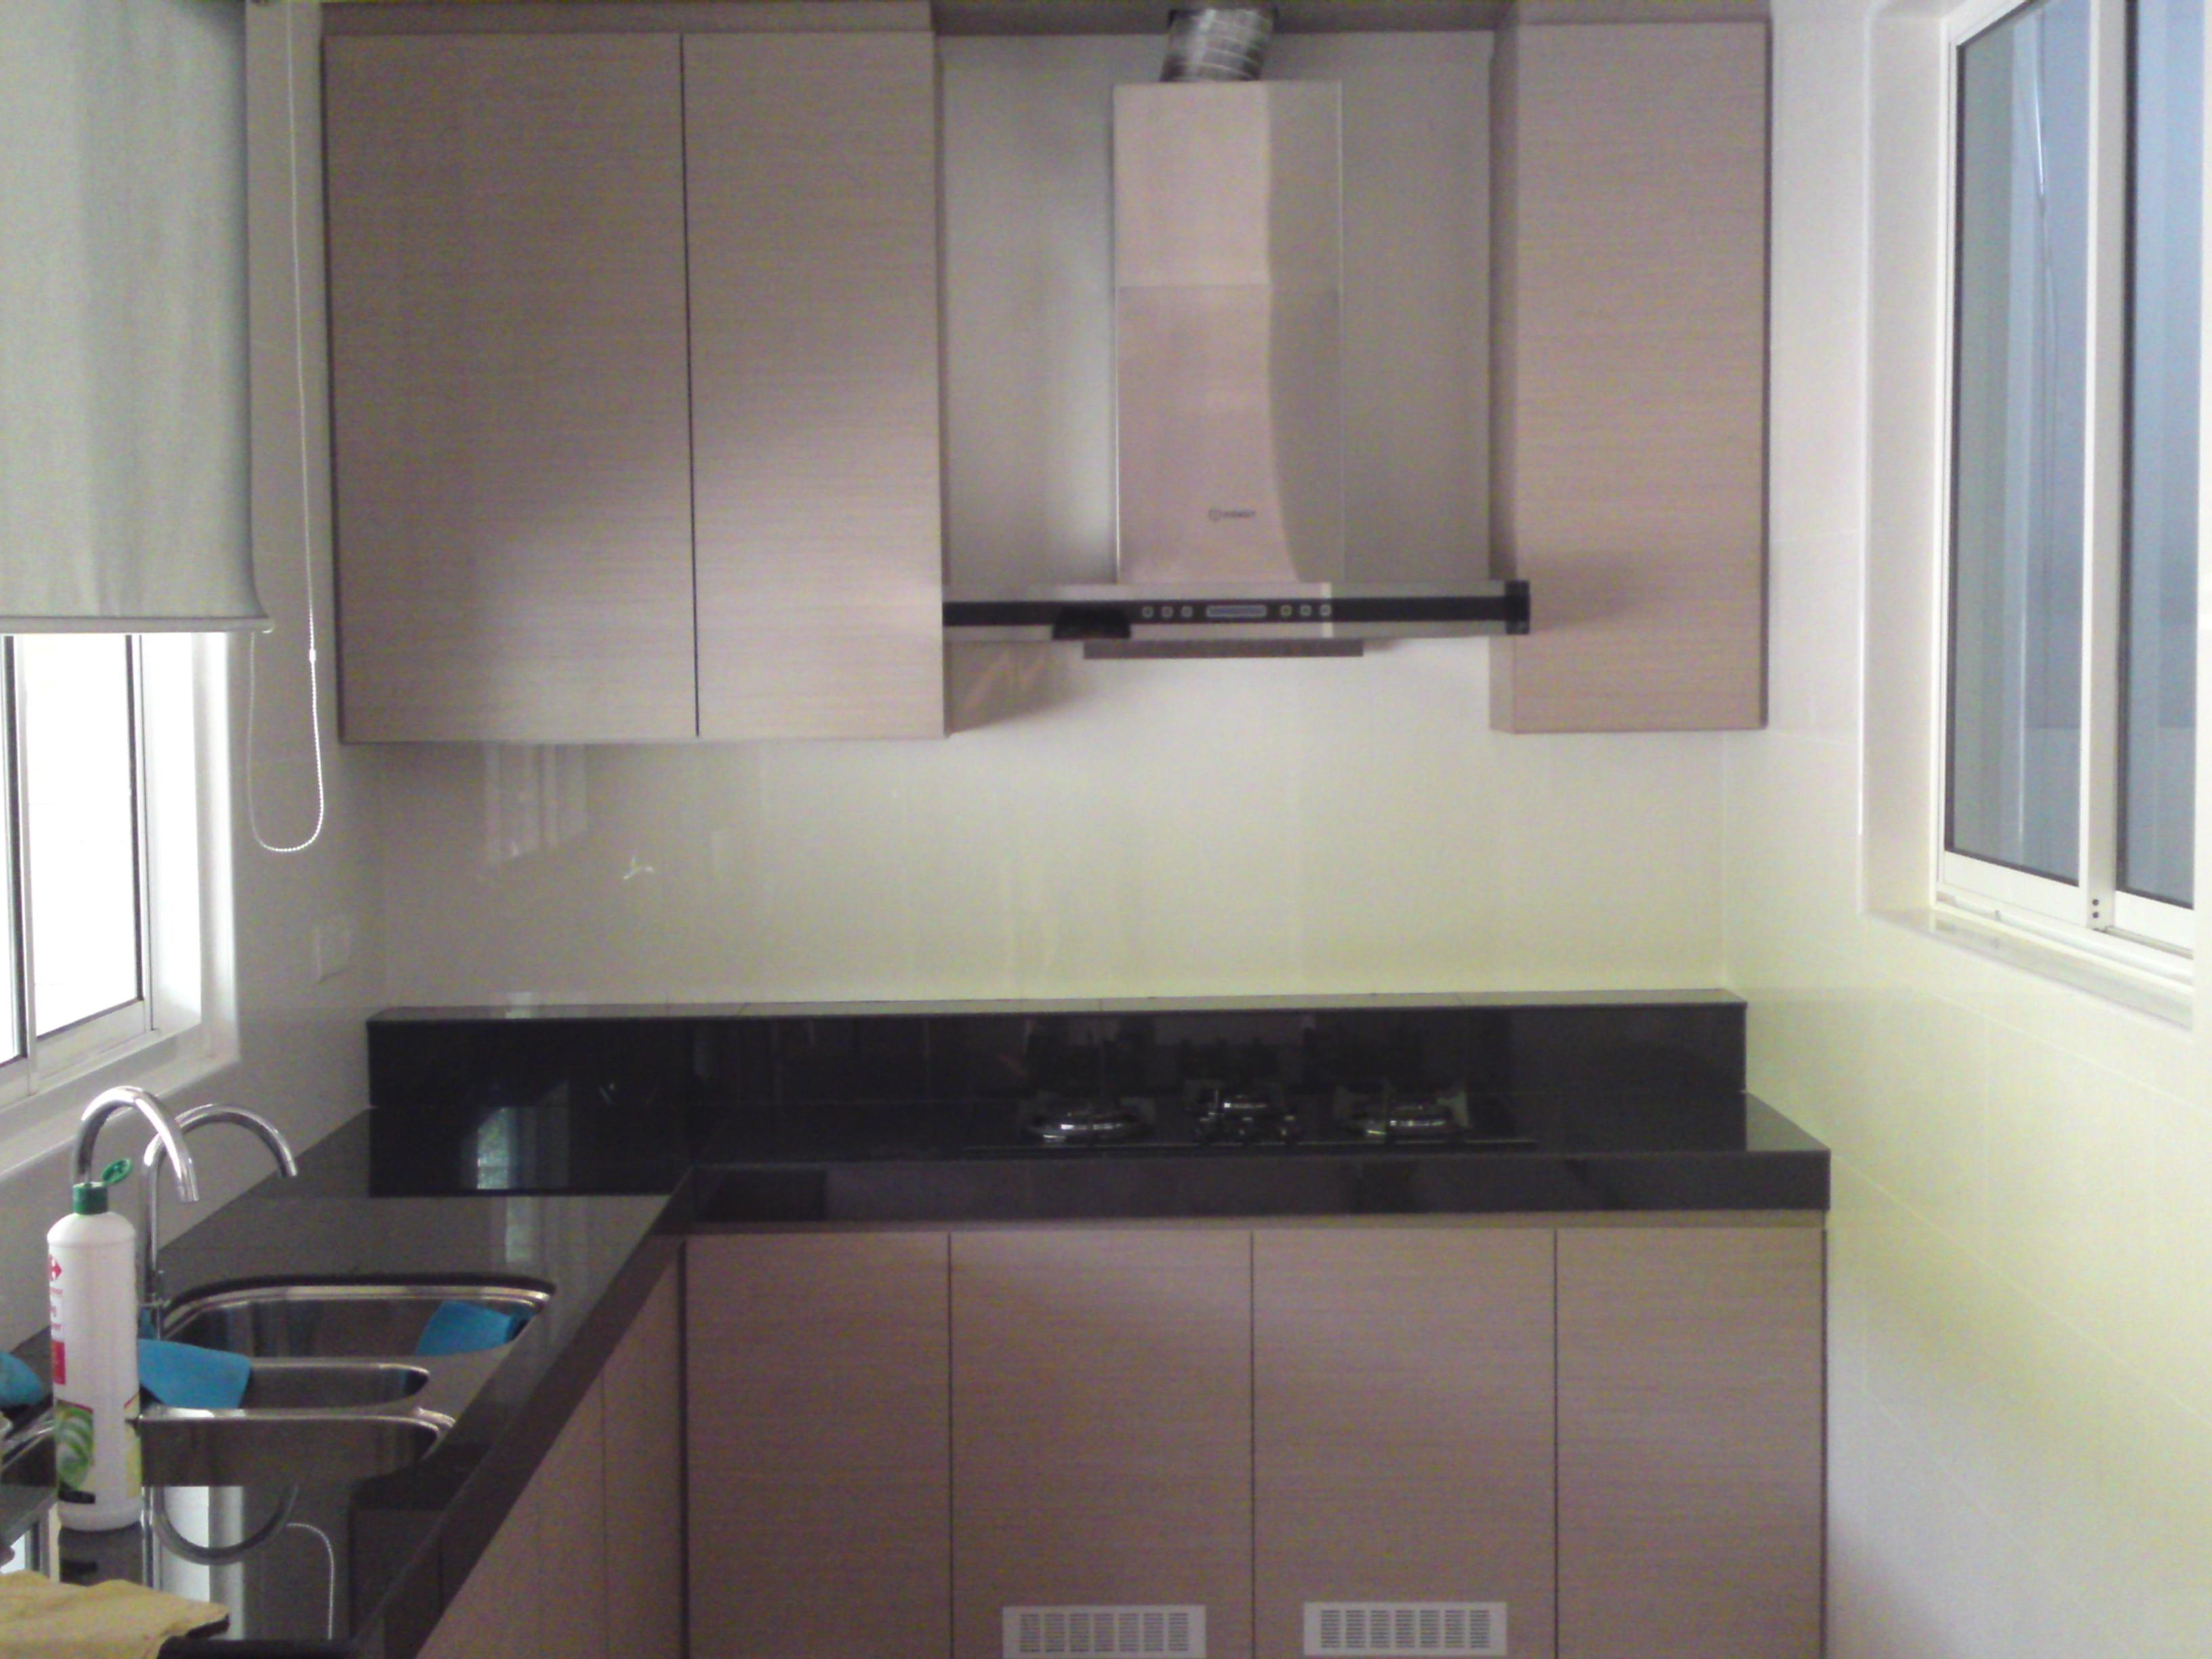 Formica Kitchen Cabinet   Home Decorating, Interior Design, Bath ...